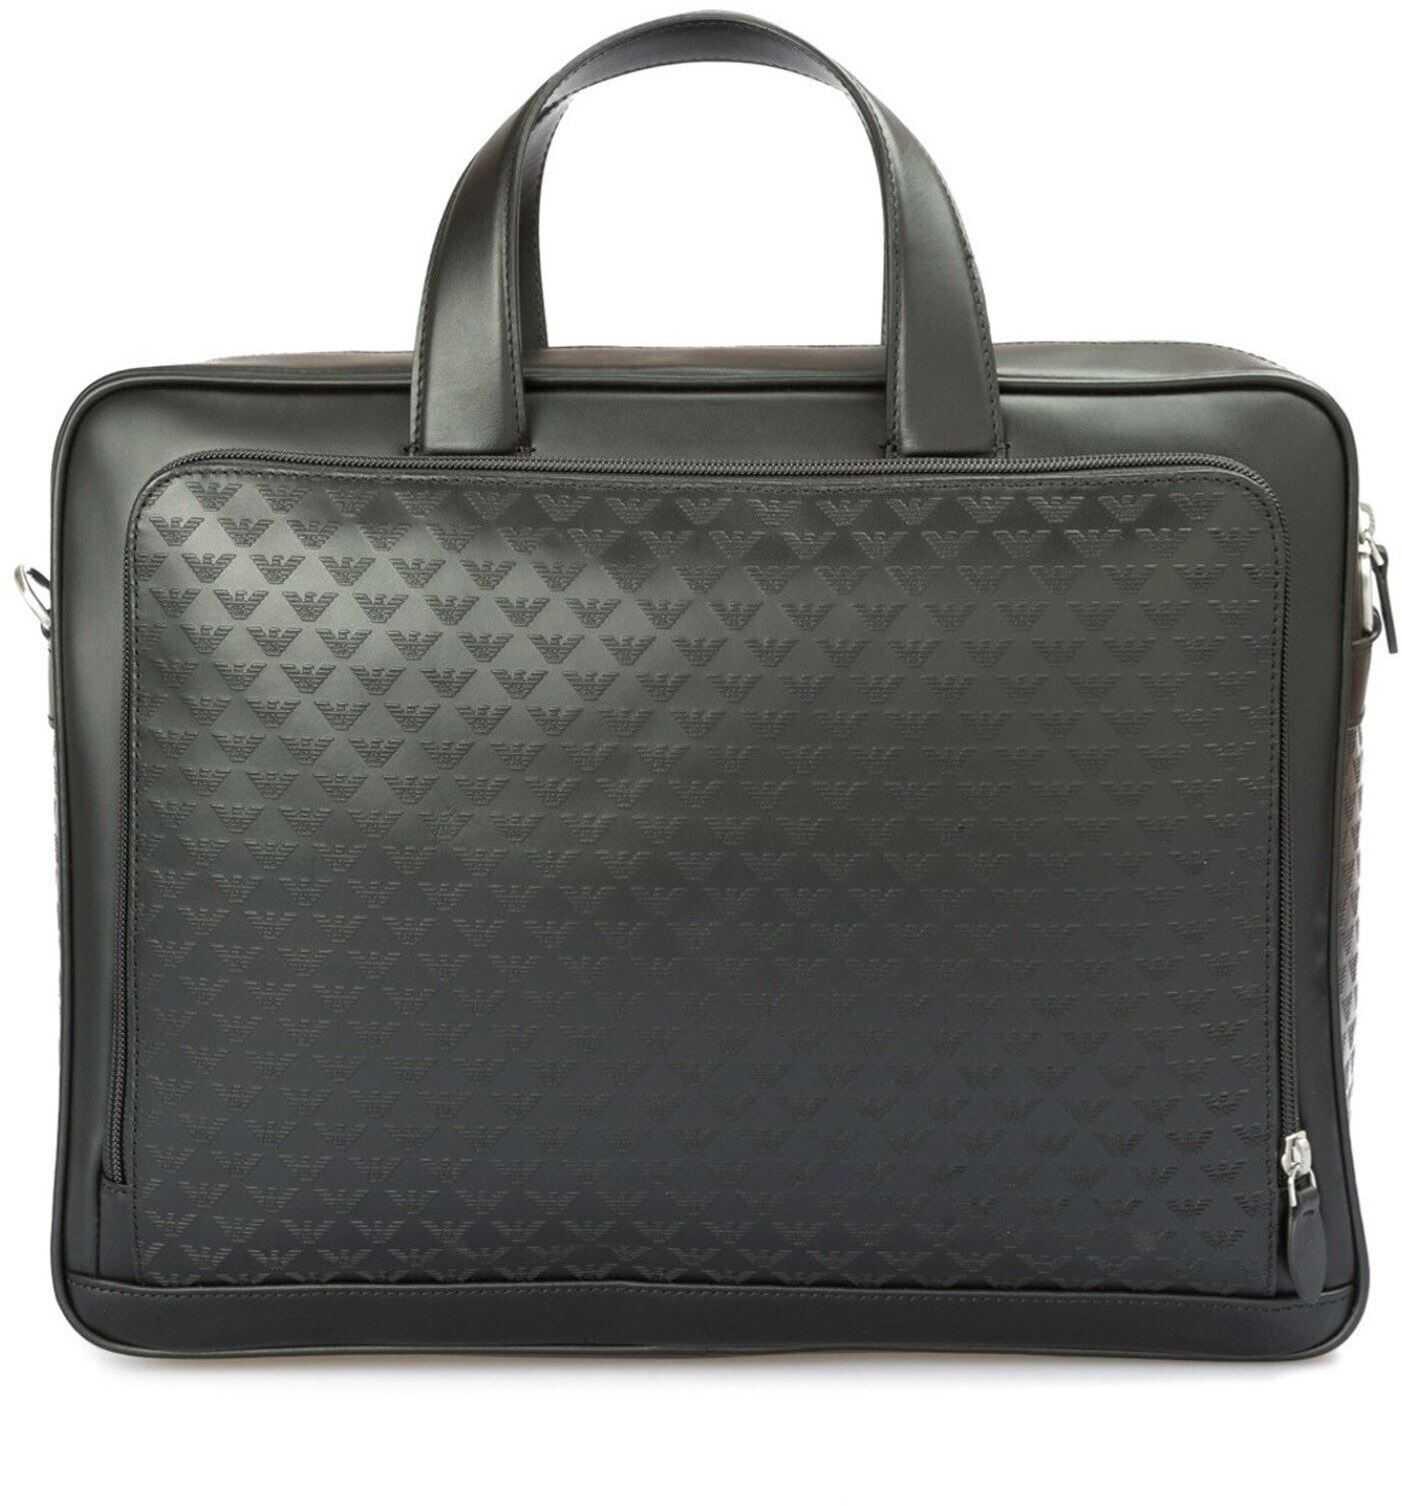 Emporio Armani All Over Embossed Logo Leather Briefcase In Black Y4P099YC04380001 Black imagine b-mall.ro